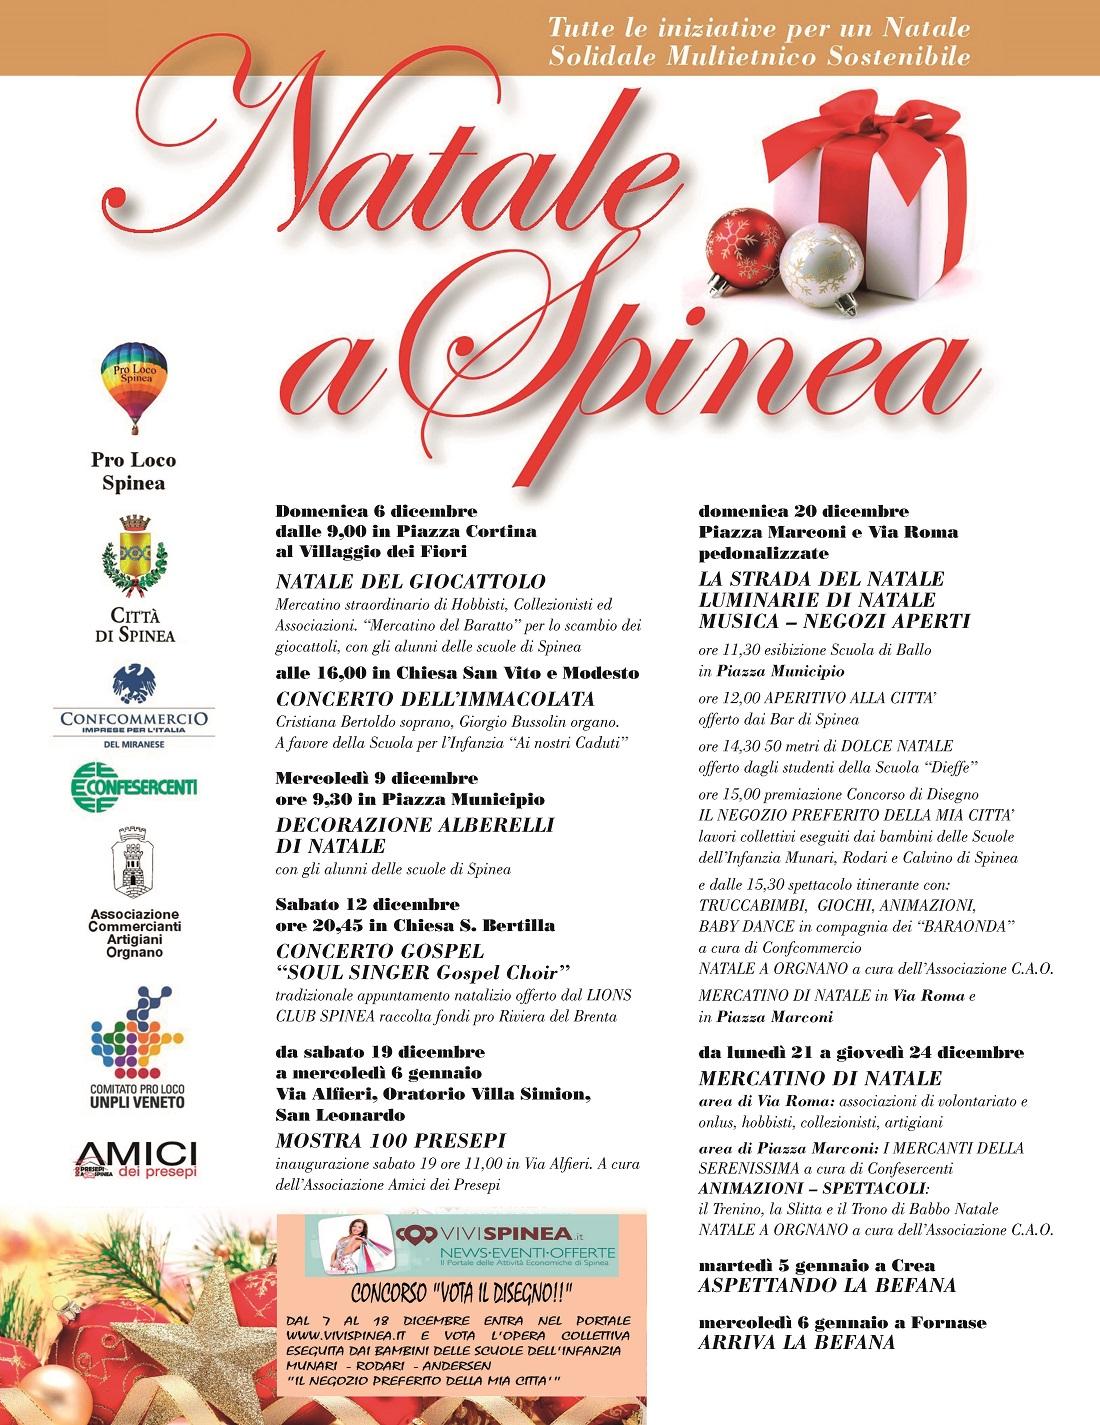 Locandina Natale a Spinea 1100